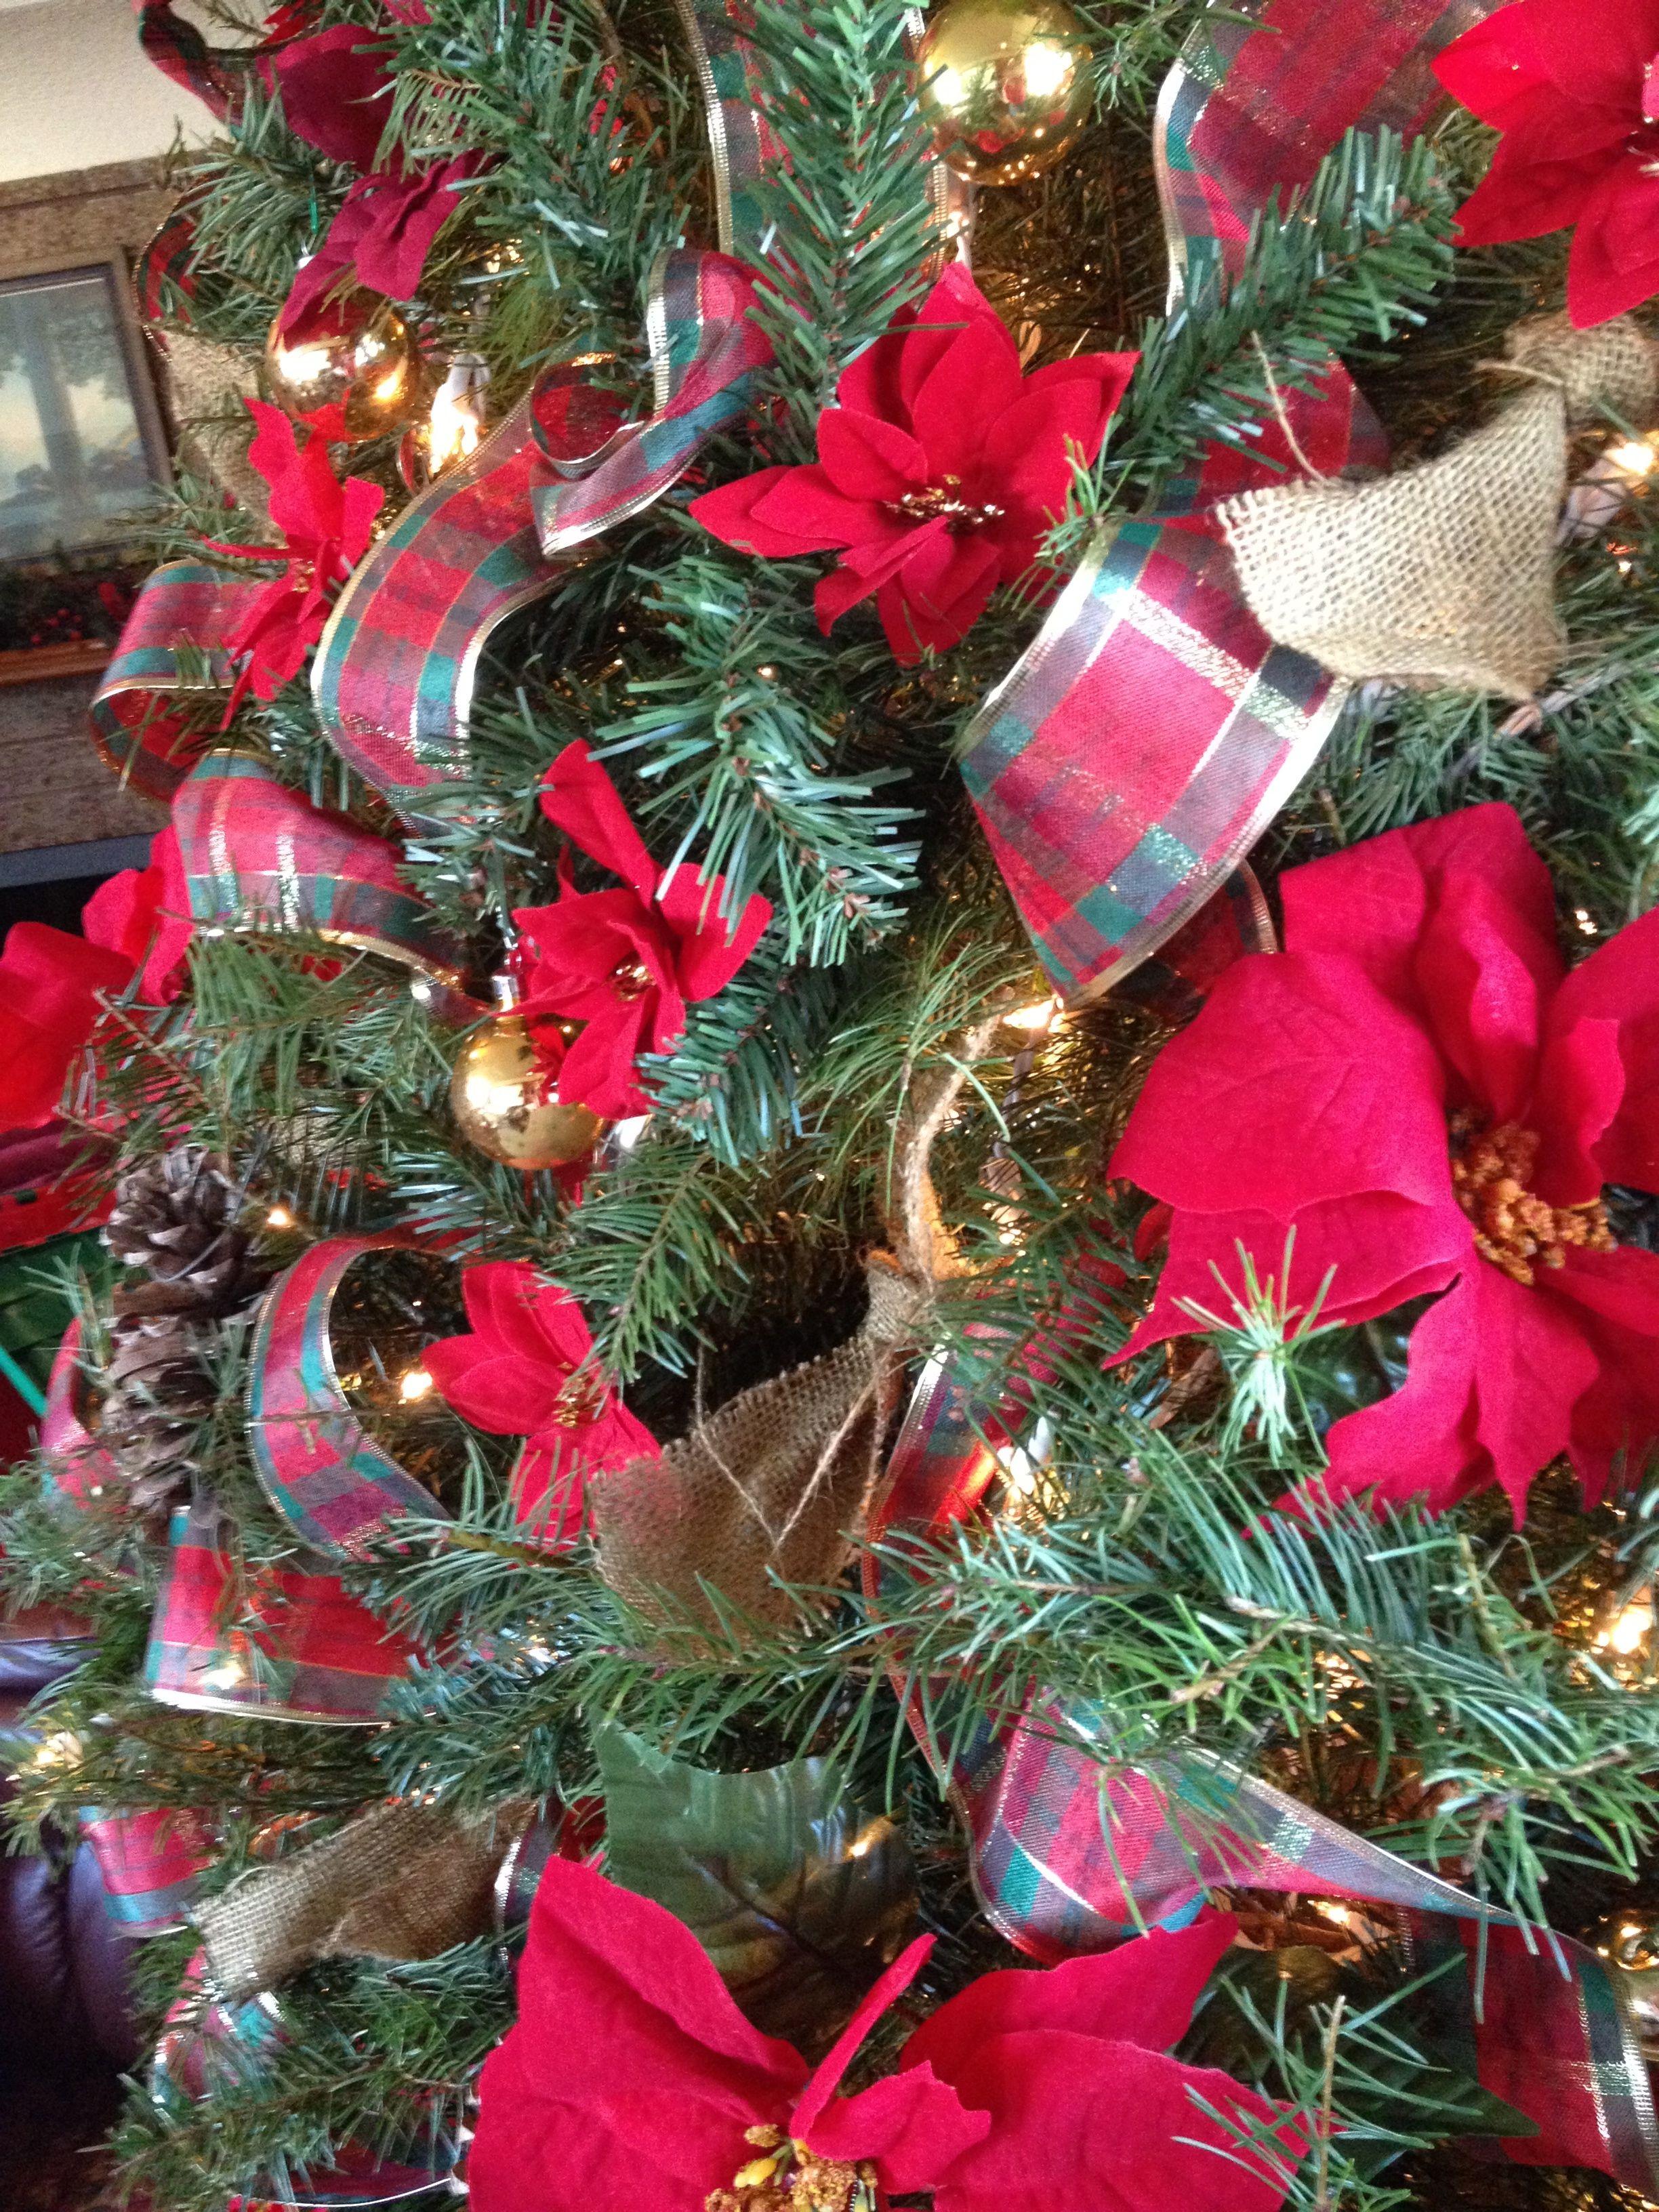 Christmas Tree Red Poinsettias, Burlap Bows, Gold Balls, Pine Cones